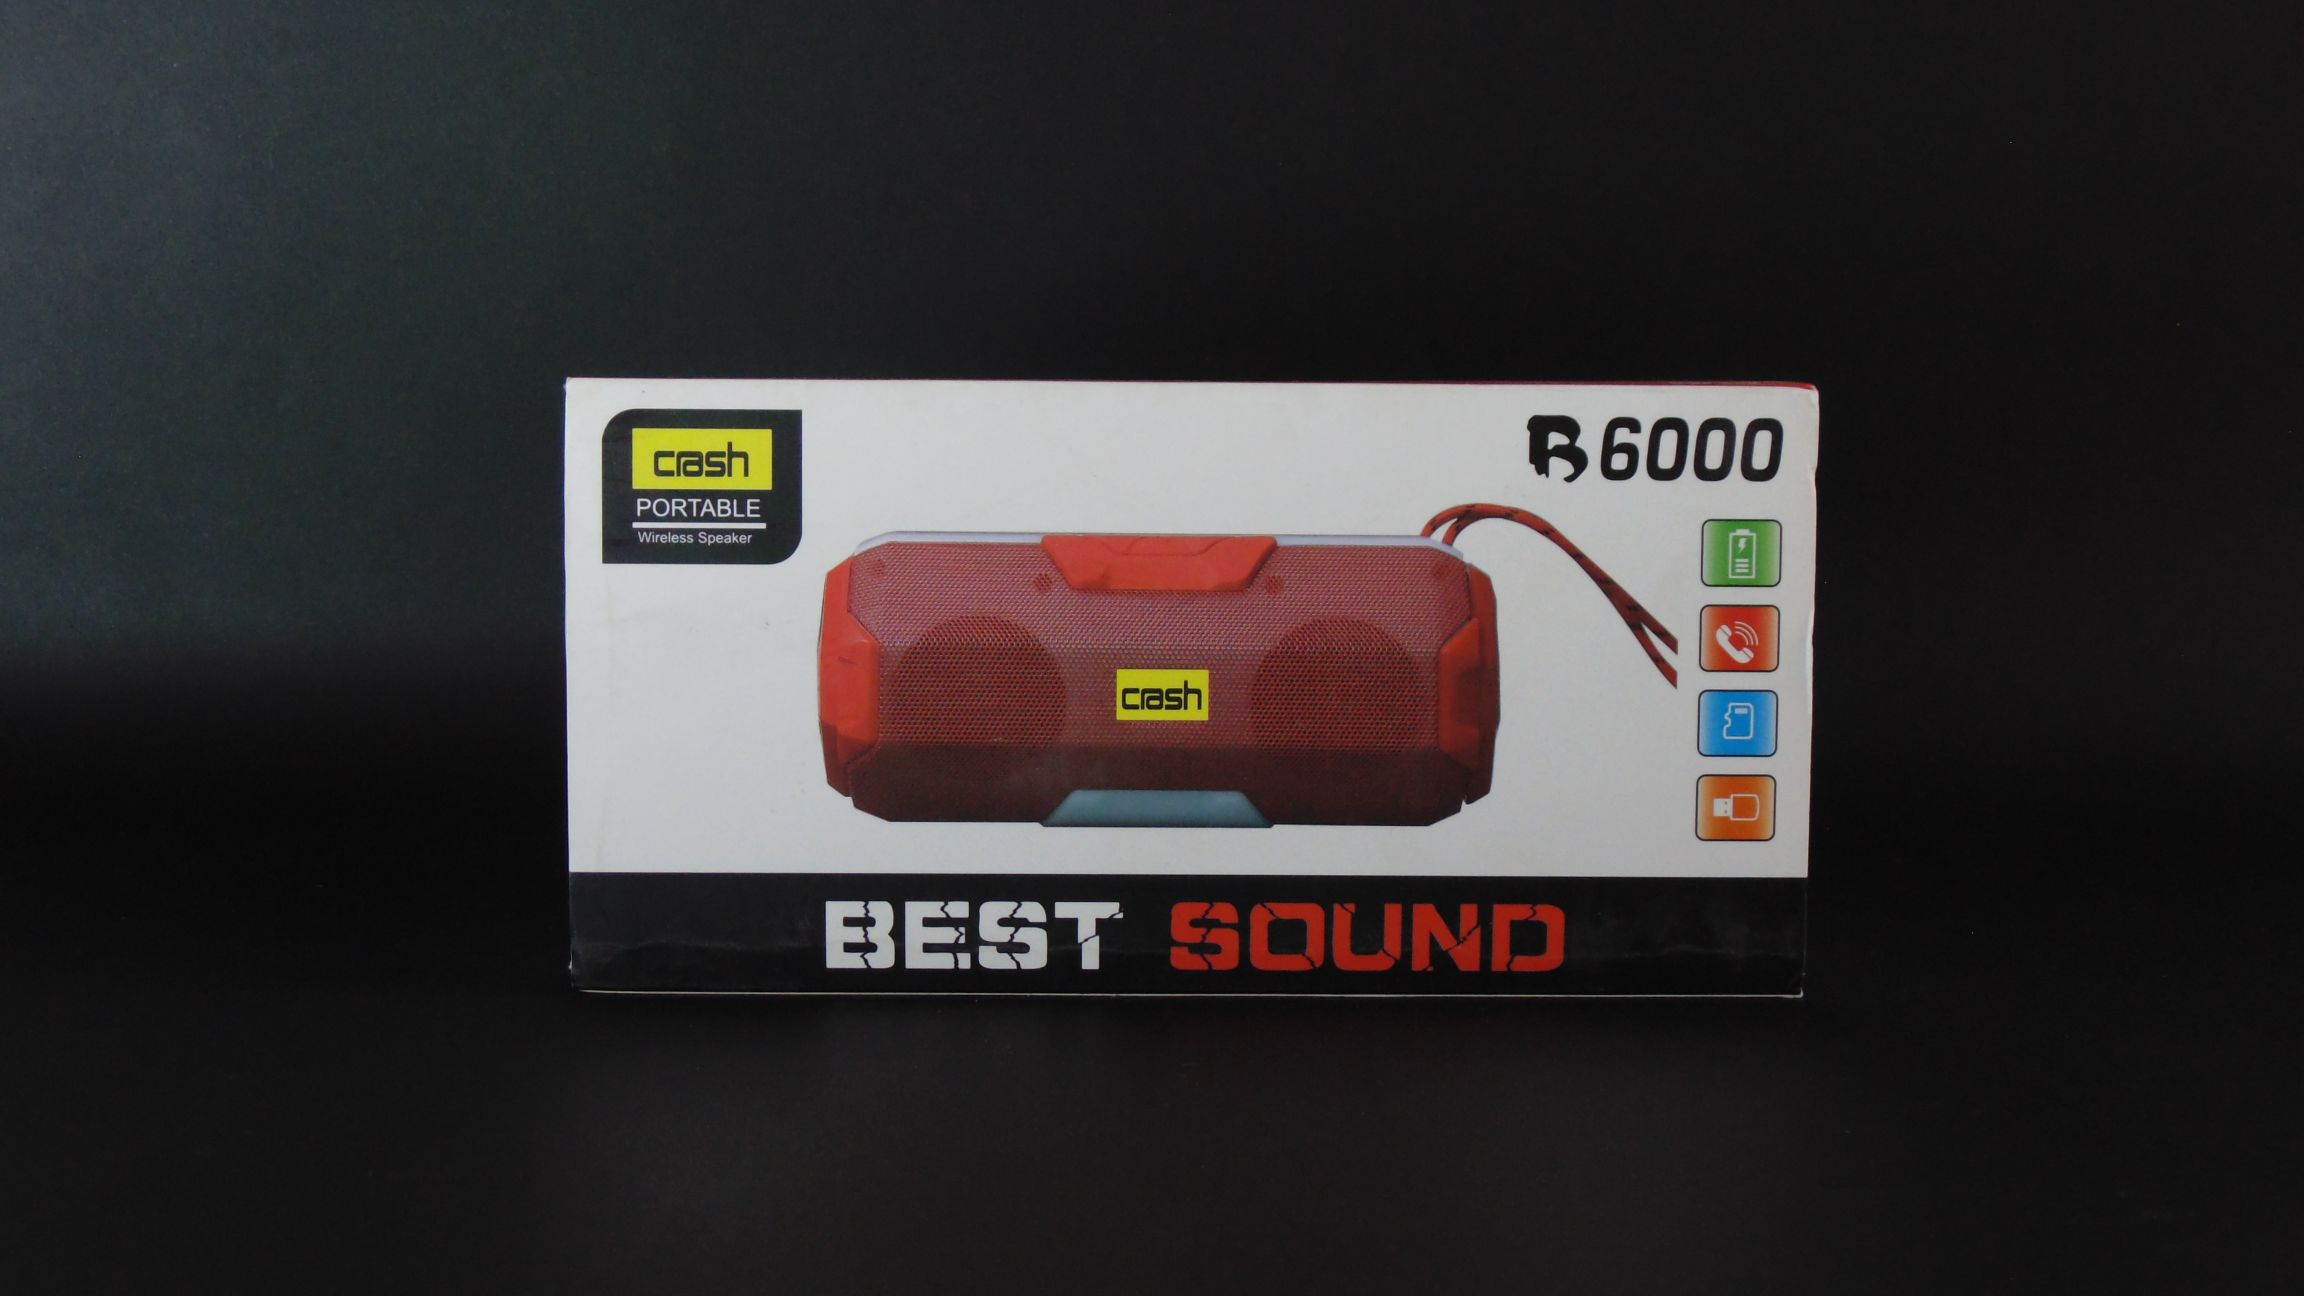 Crash BT Speaker B6000